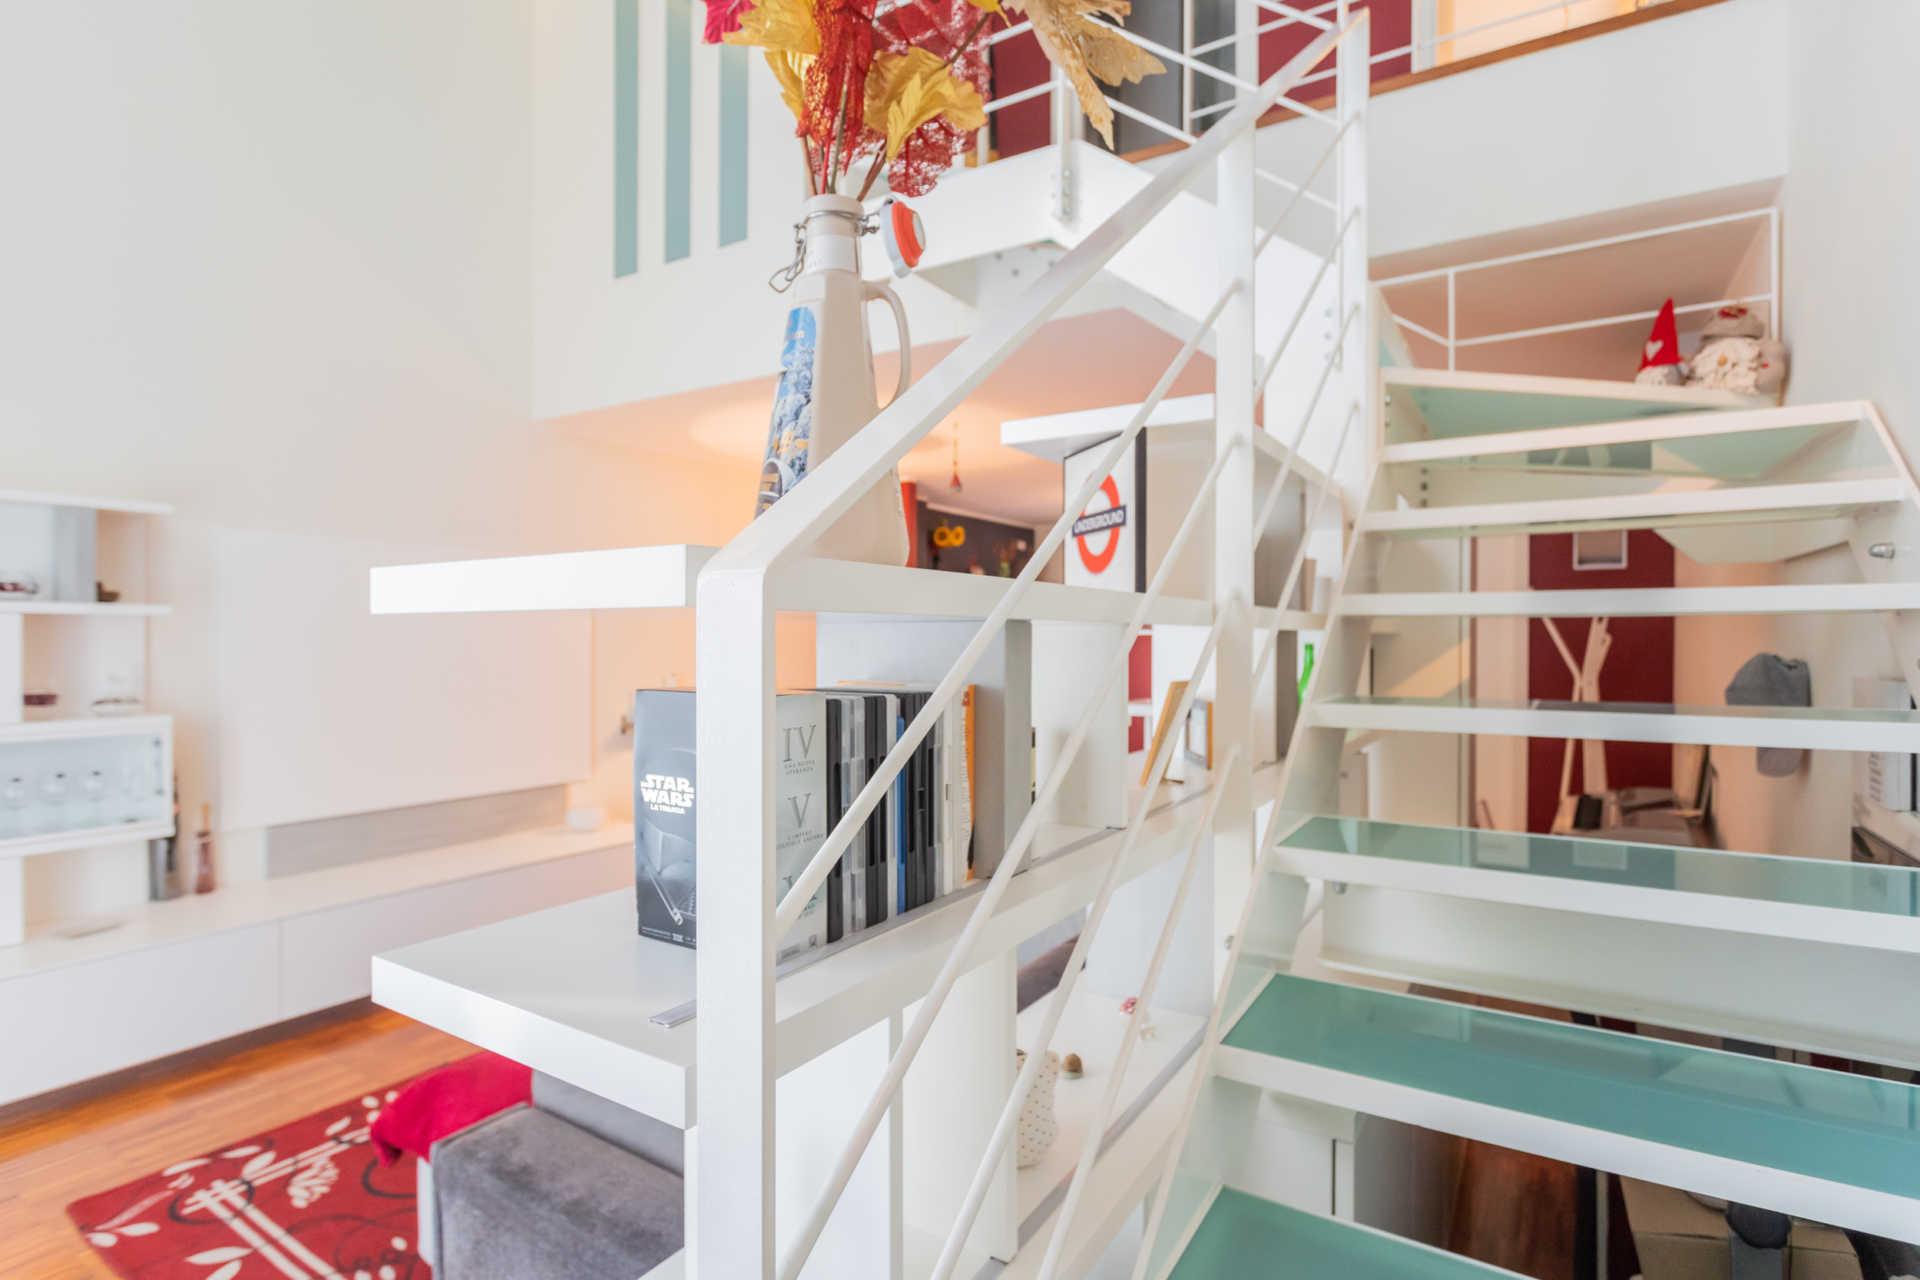 appartamento_brugherio-26